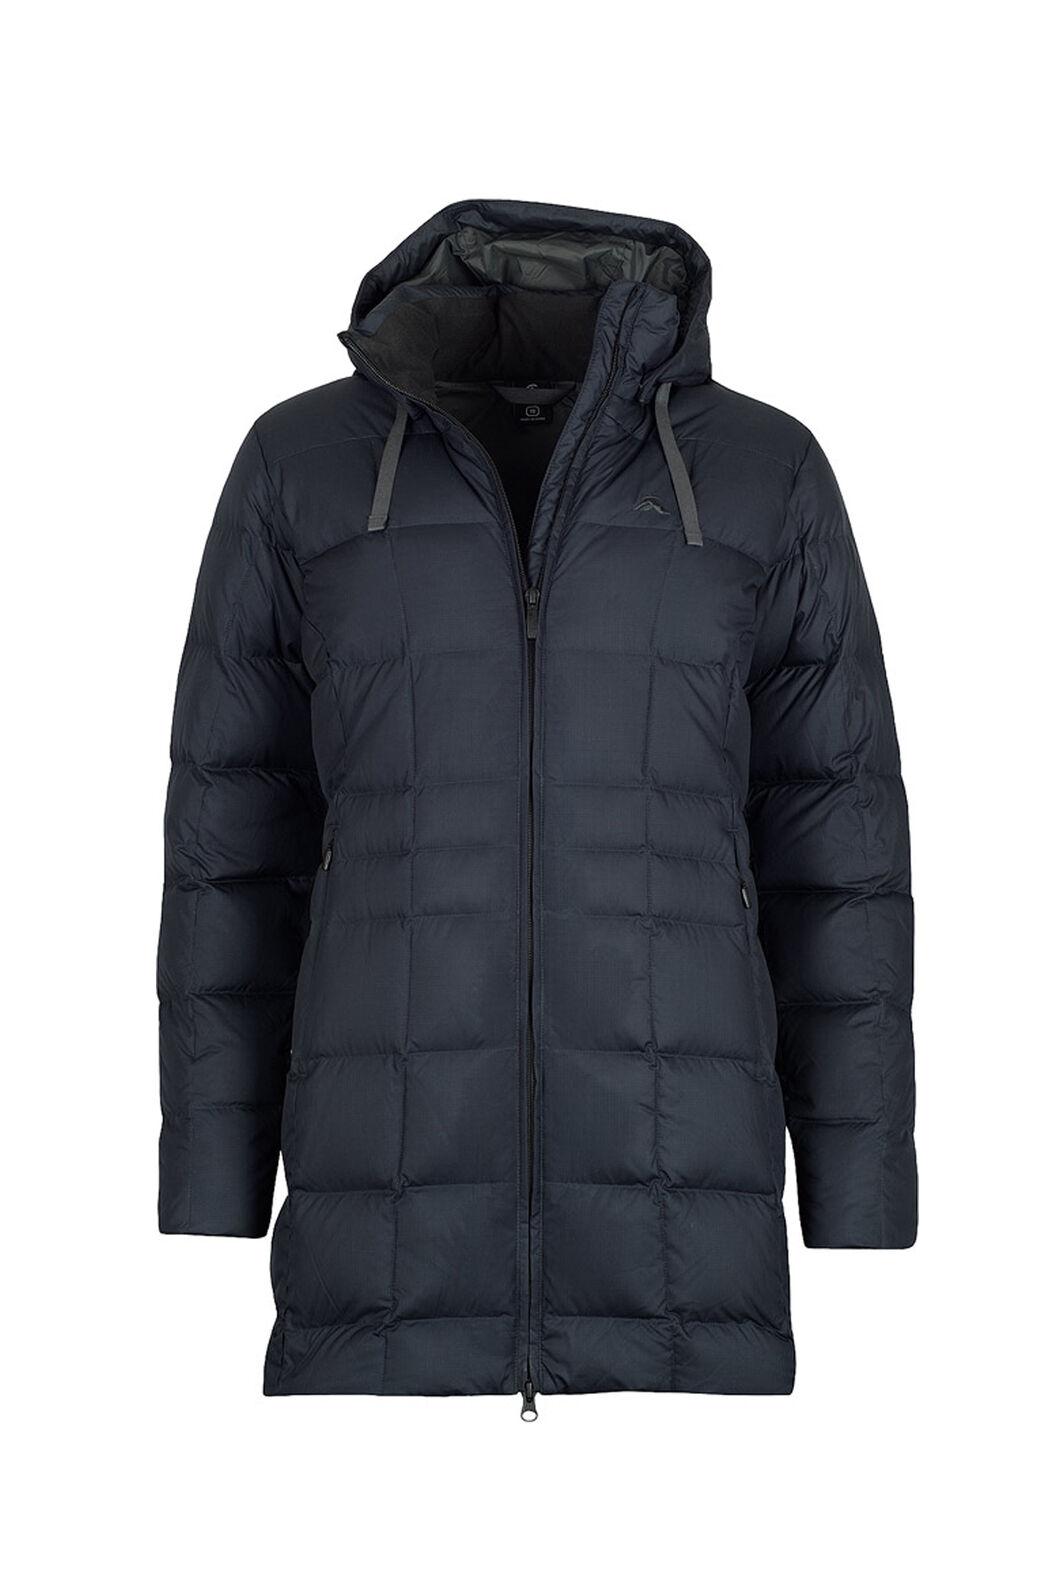 Macpac Aurora Down Coat — Women's, Carbon, hi-res